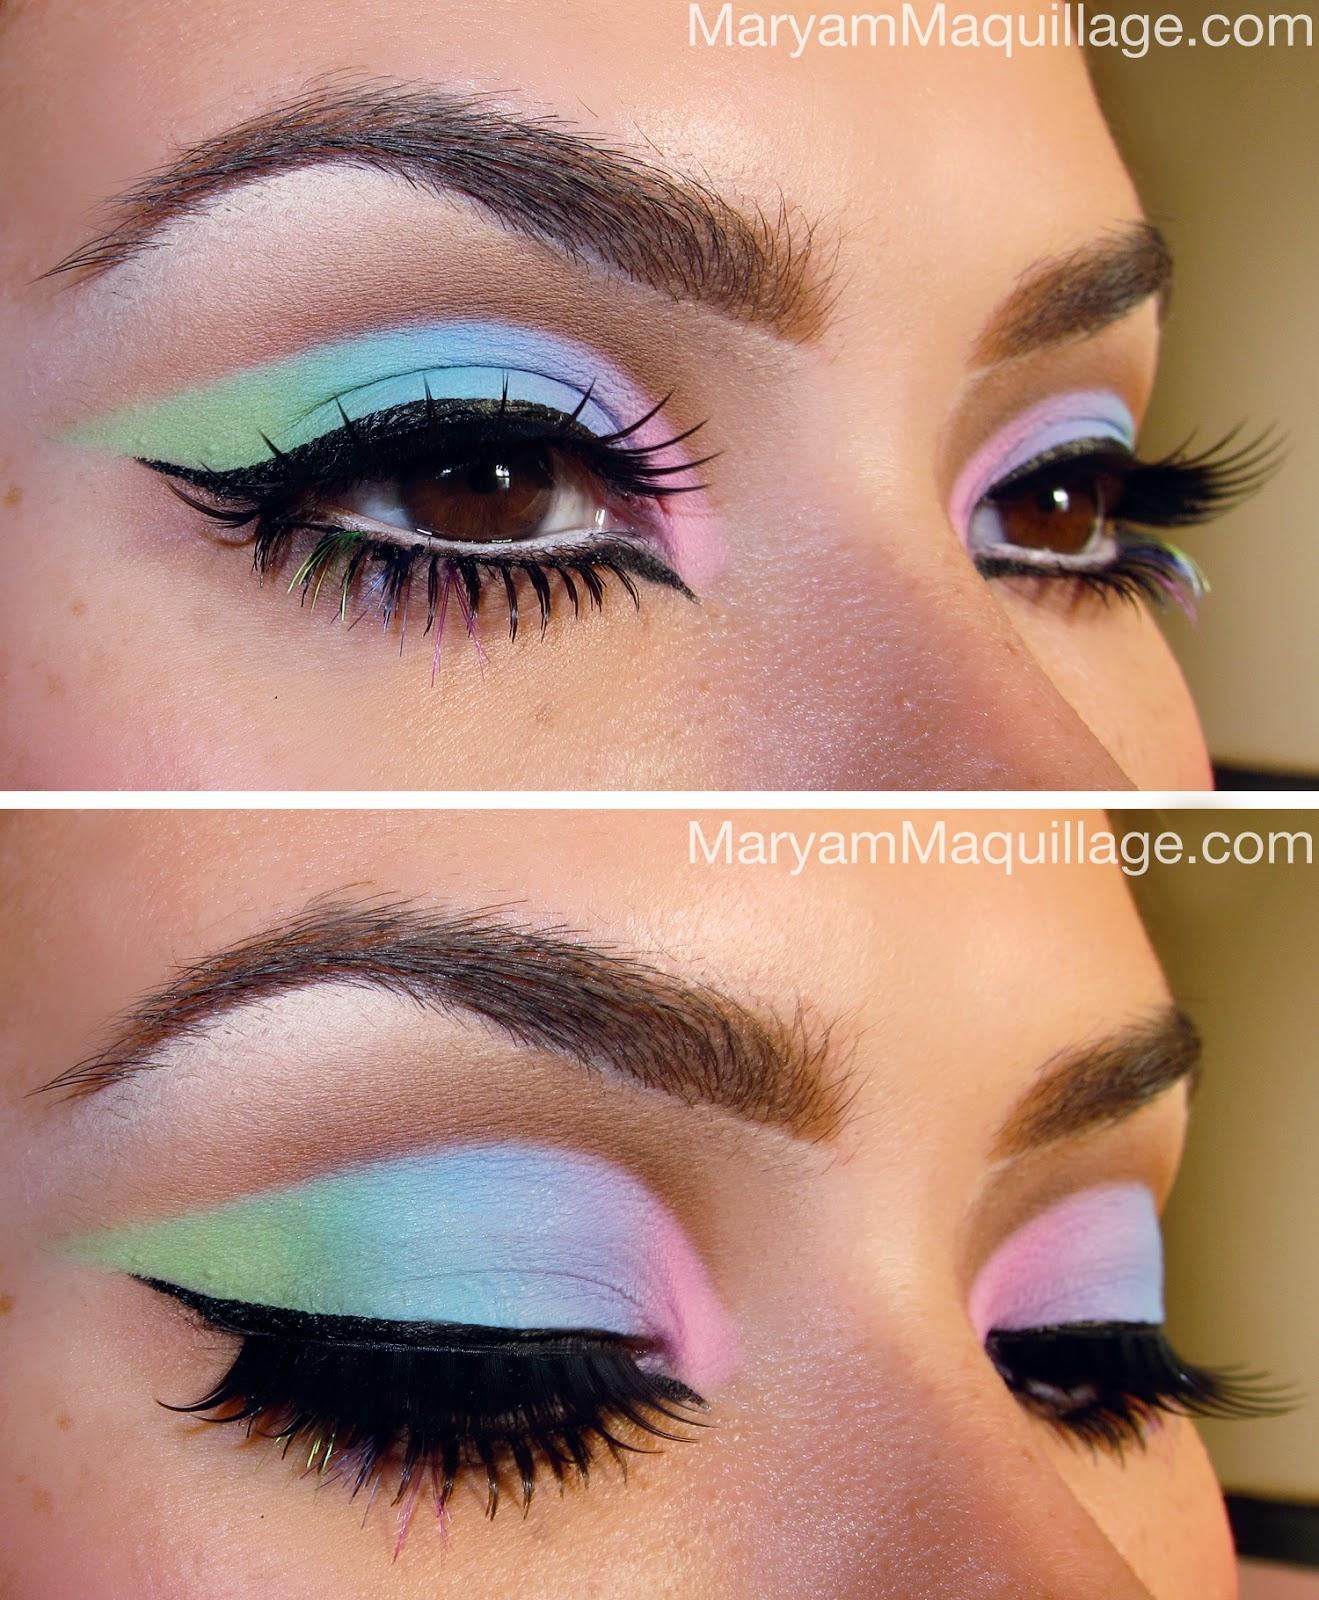 Maryam Maquillage: Cut-Crease Pastel Rainbows!